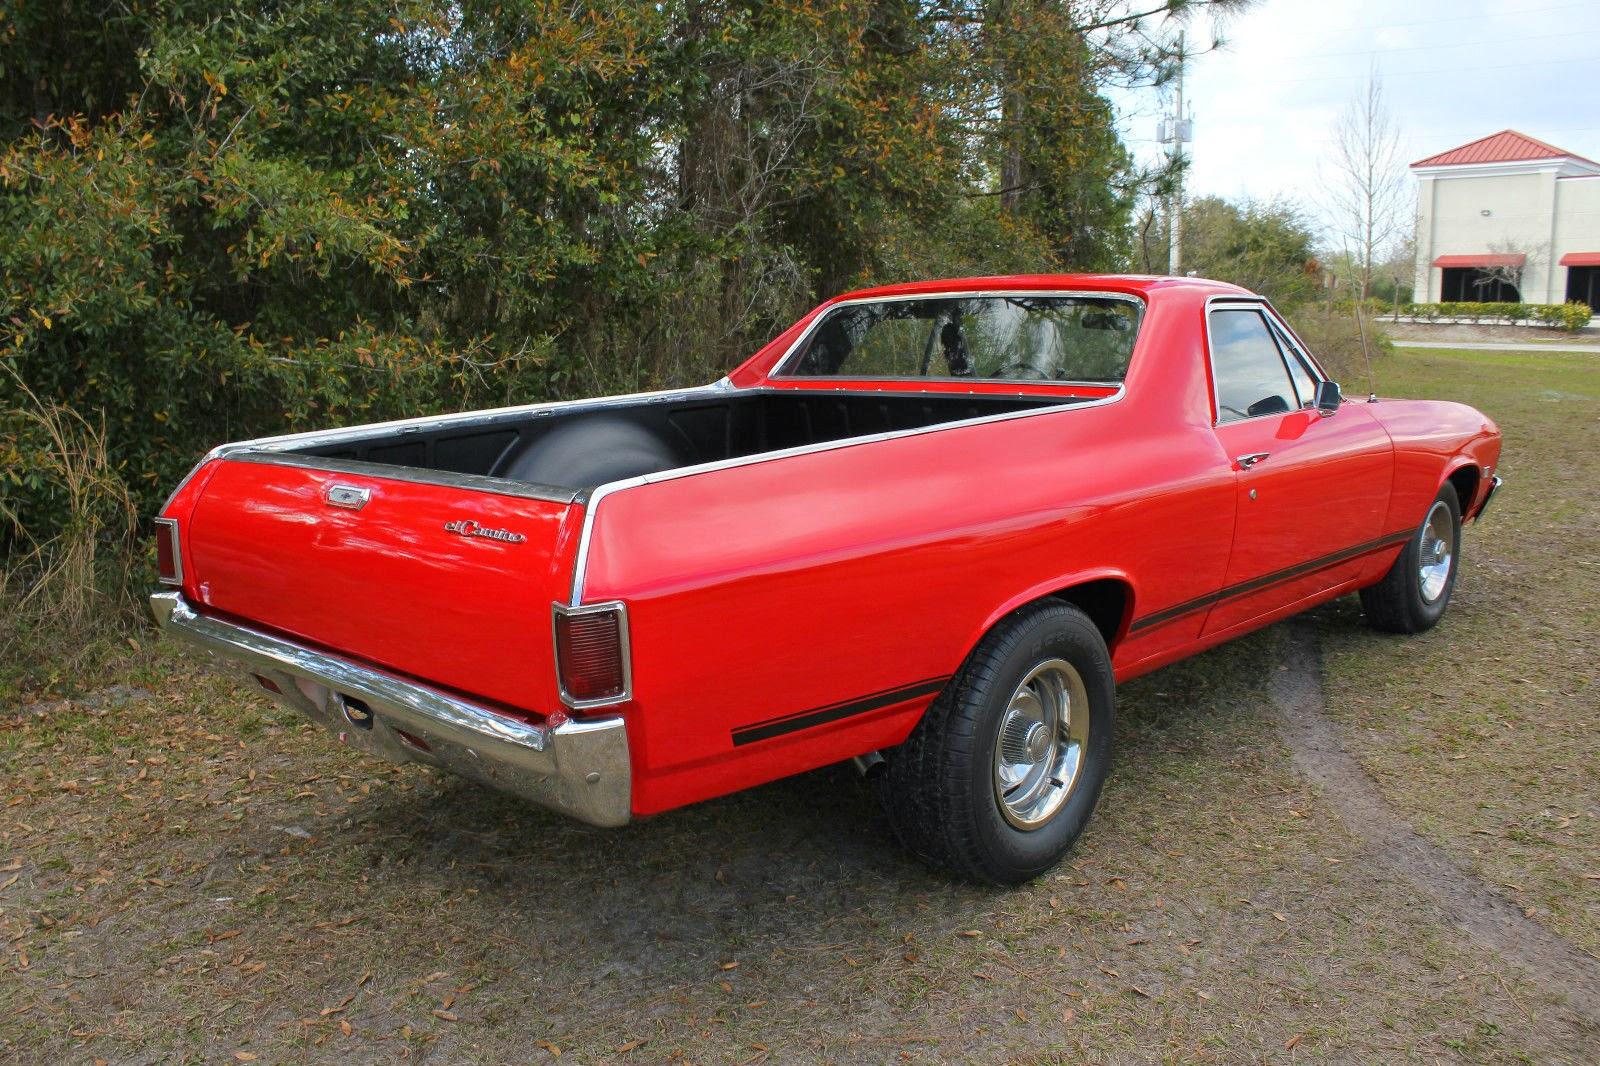 All American Classic Cars 1968 Chevrolet El Camino Chevy